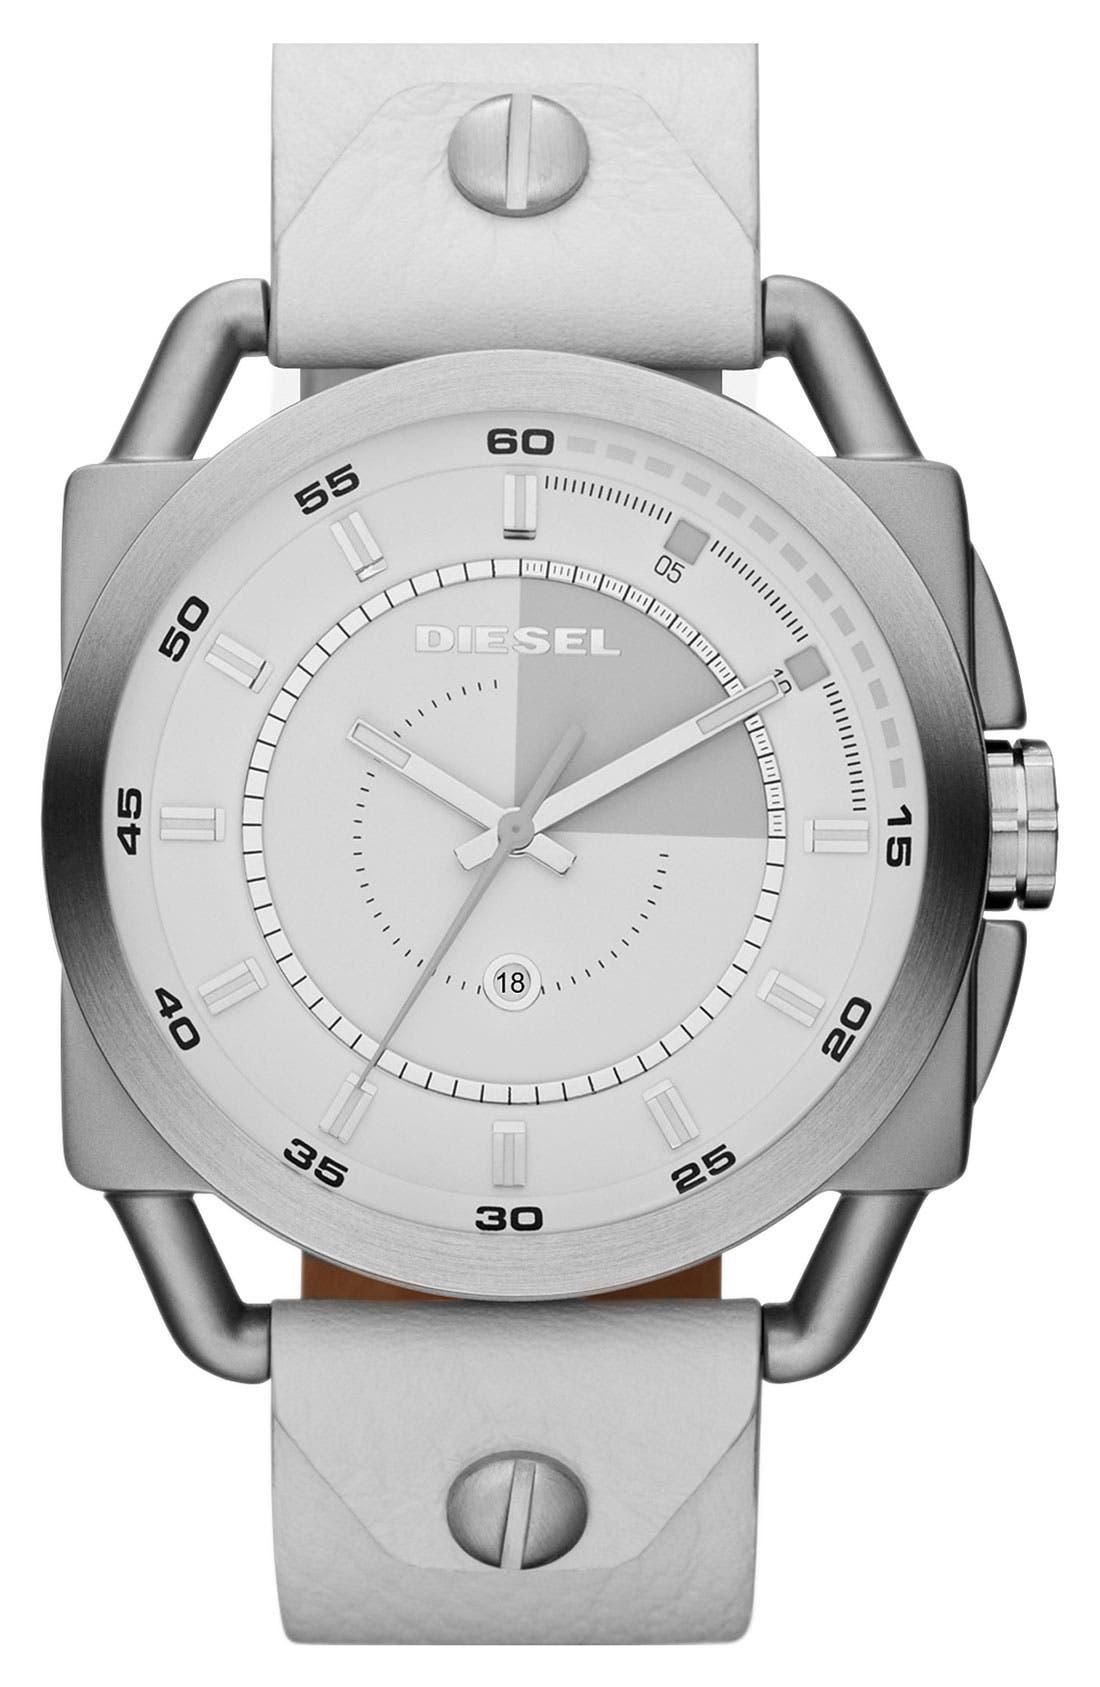 Alternate Image 1 Selected - DIESEL® 'Descender' Leather Strap Watch, 50mm